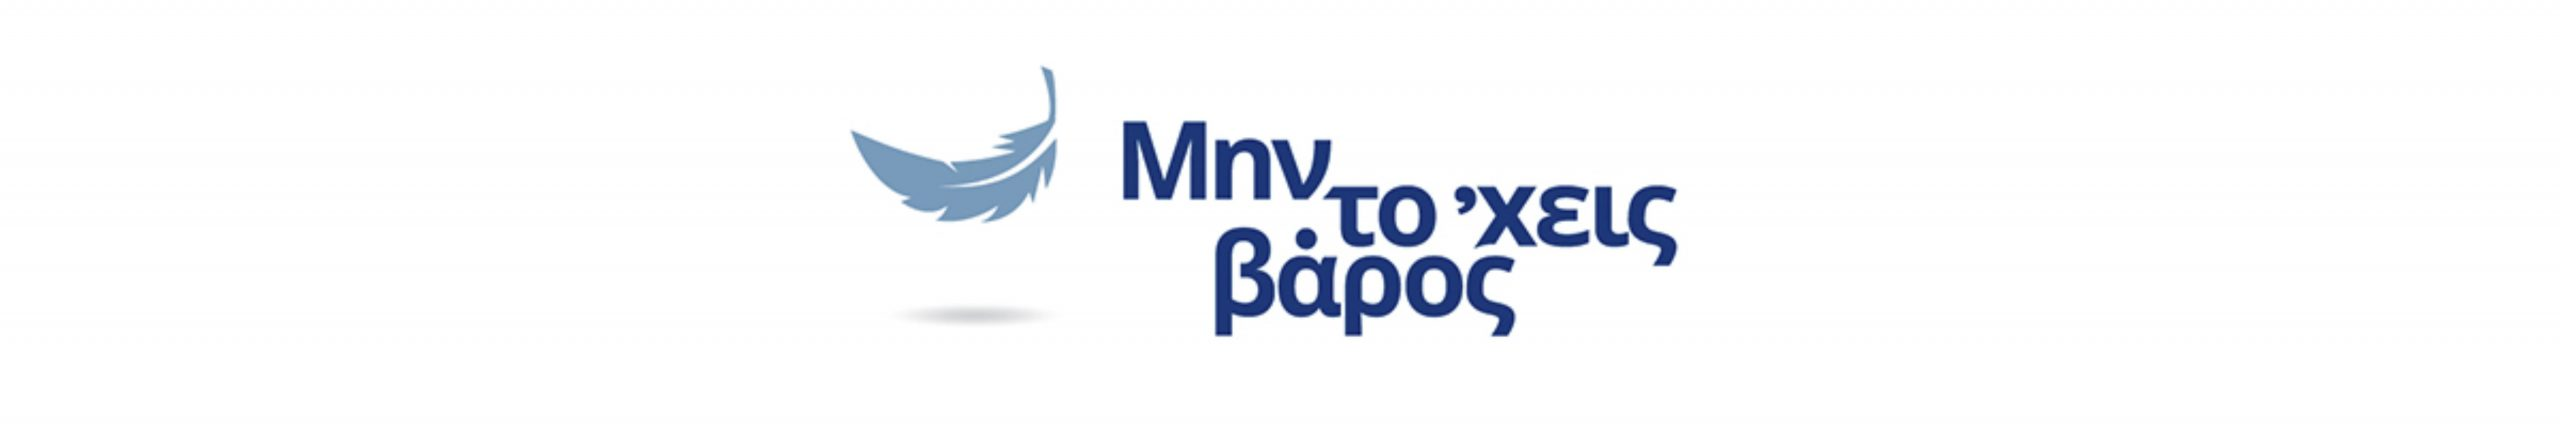 Mintoxeisvaros.gr: Νέος ιστότοπος για την  παχυσαρκία από την Novo Nordisk Hellas